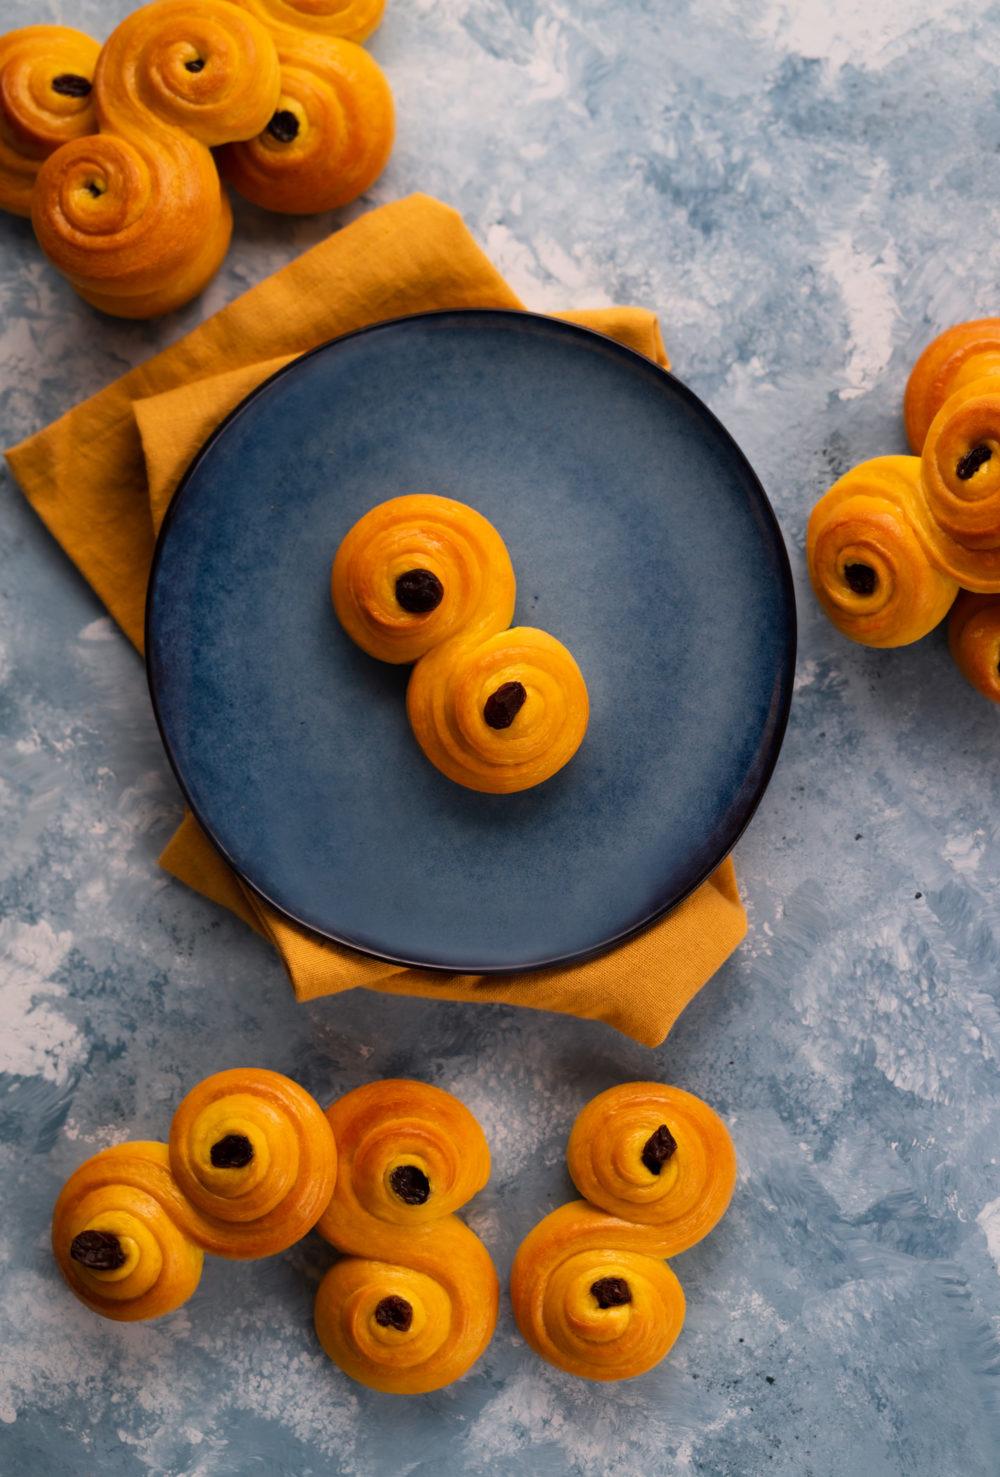 Norwegian saffron buns on a blue plate